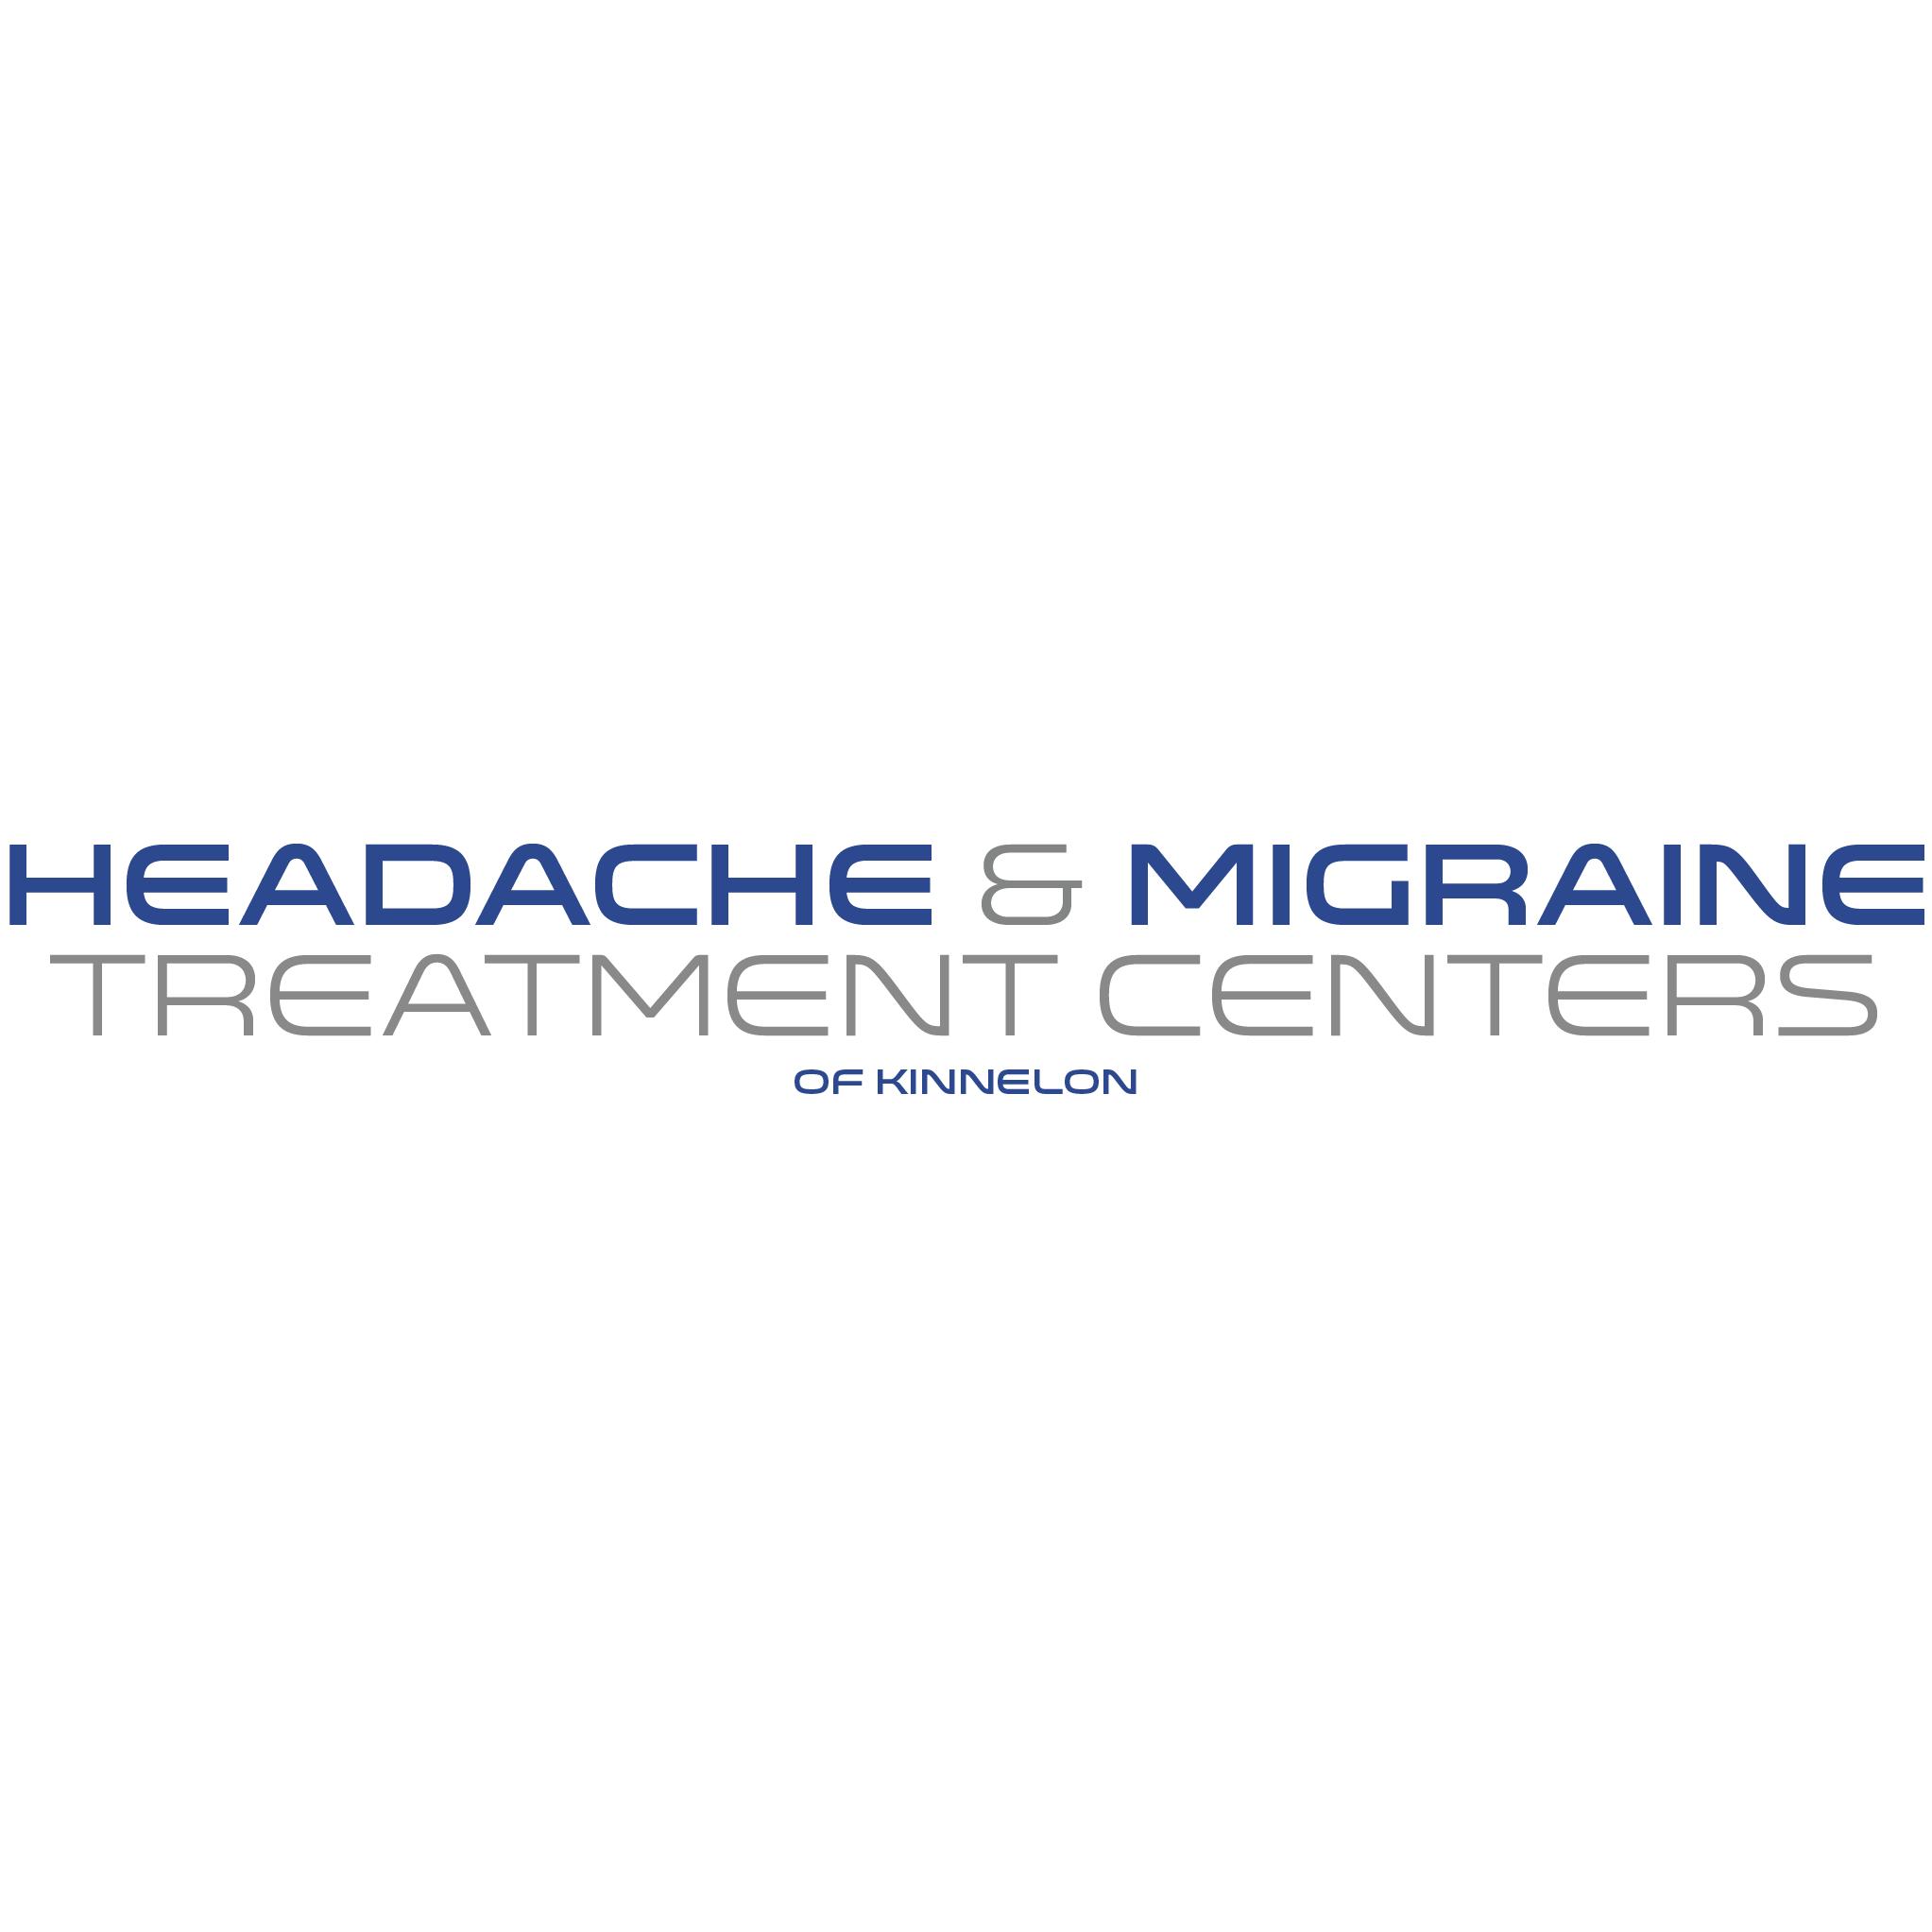 Headache and Migraine Center of Kinnelon